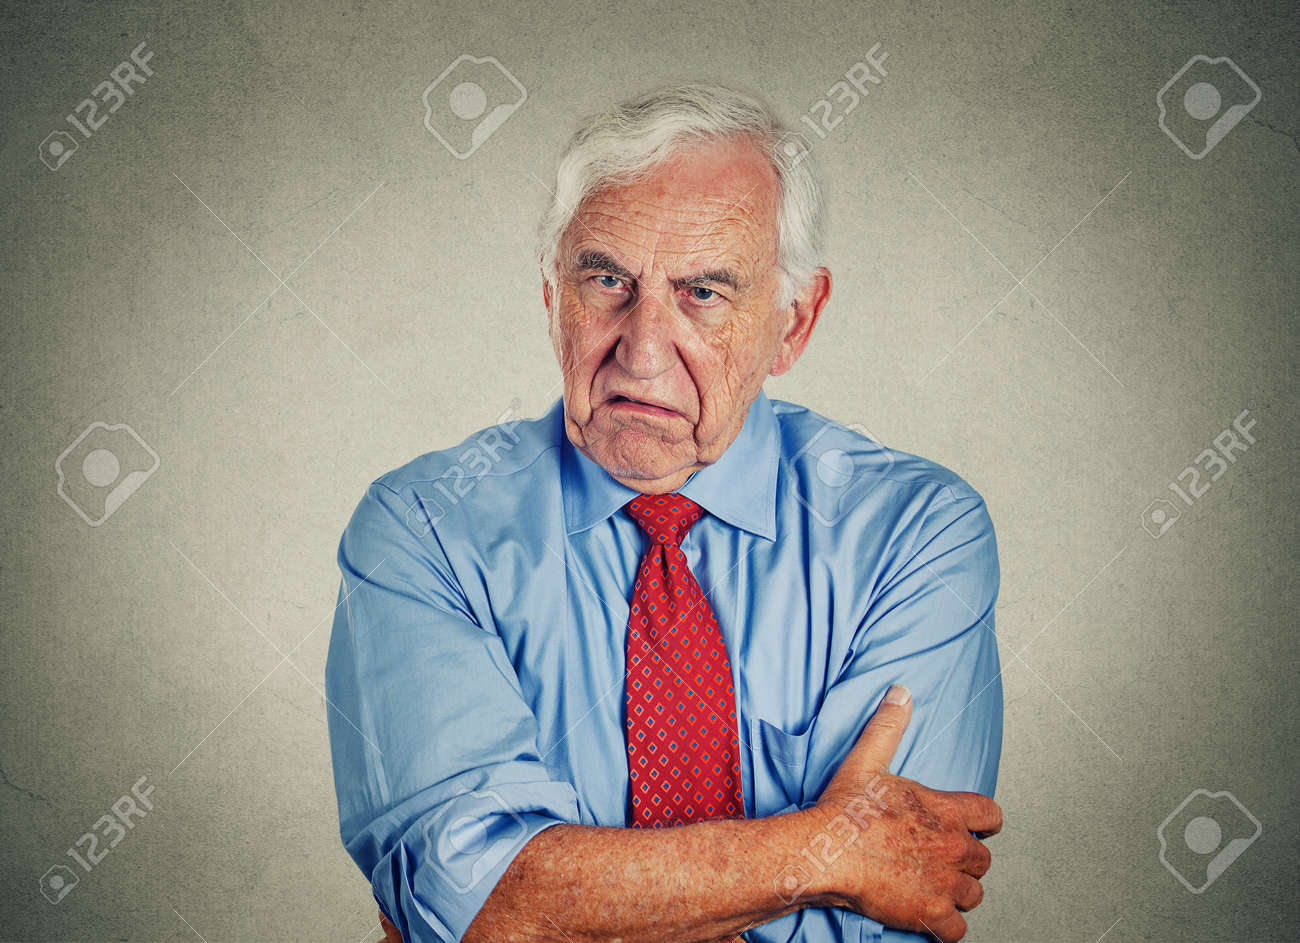 grumpy old man stock photos. royalty free grumpy old man images